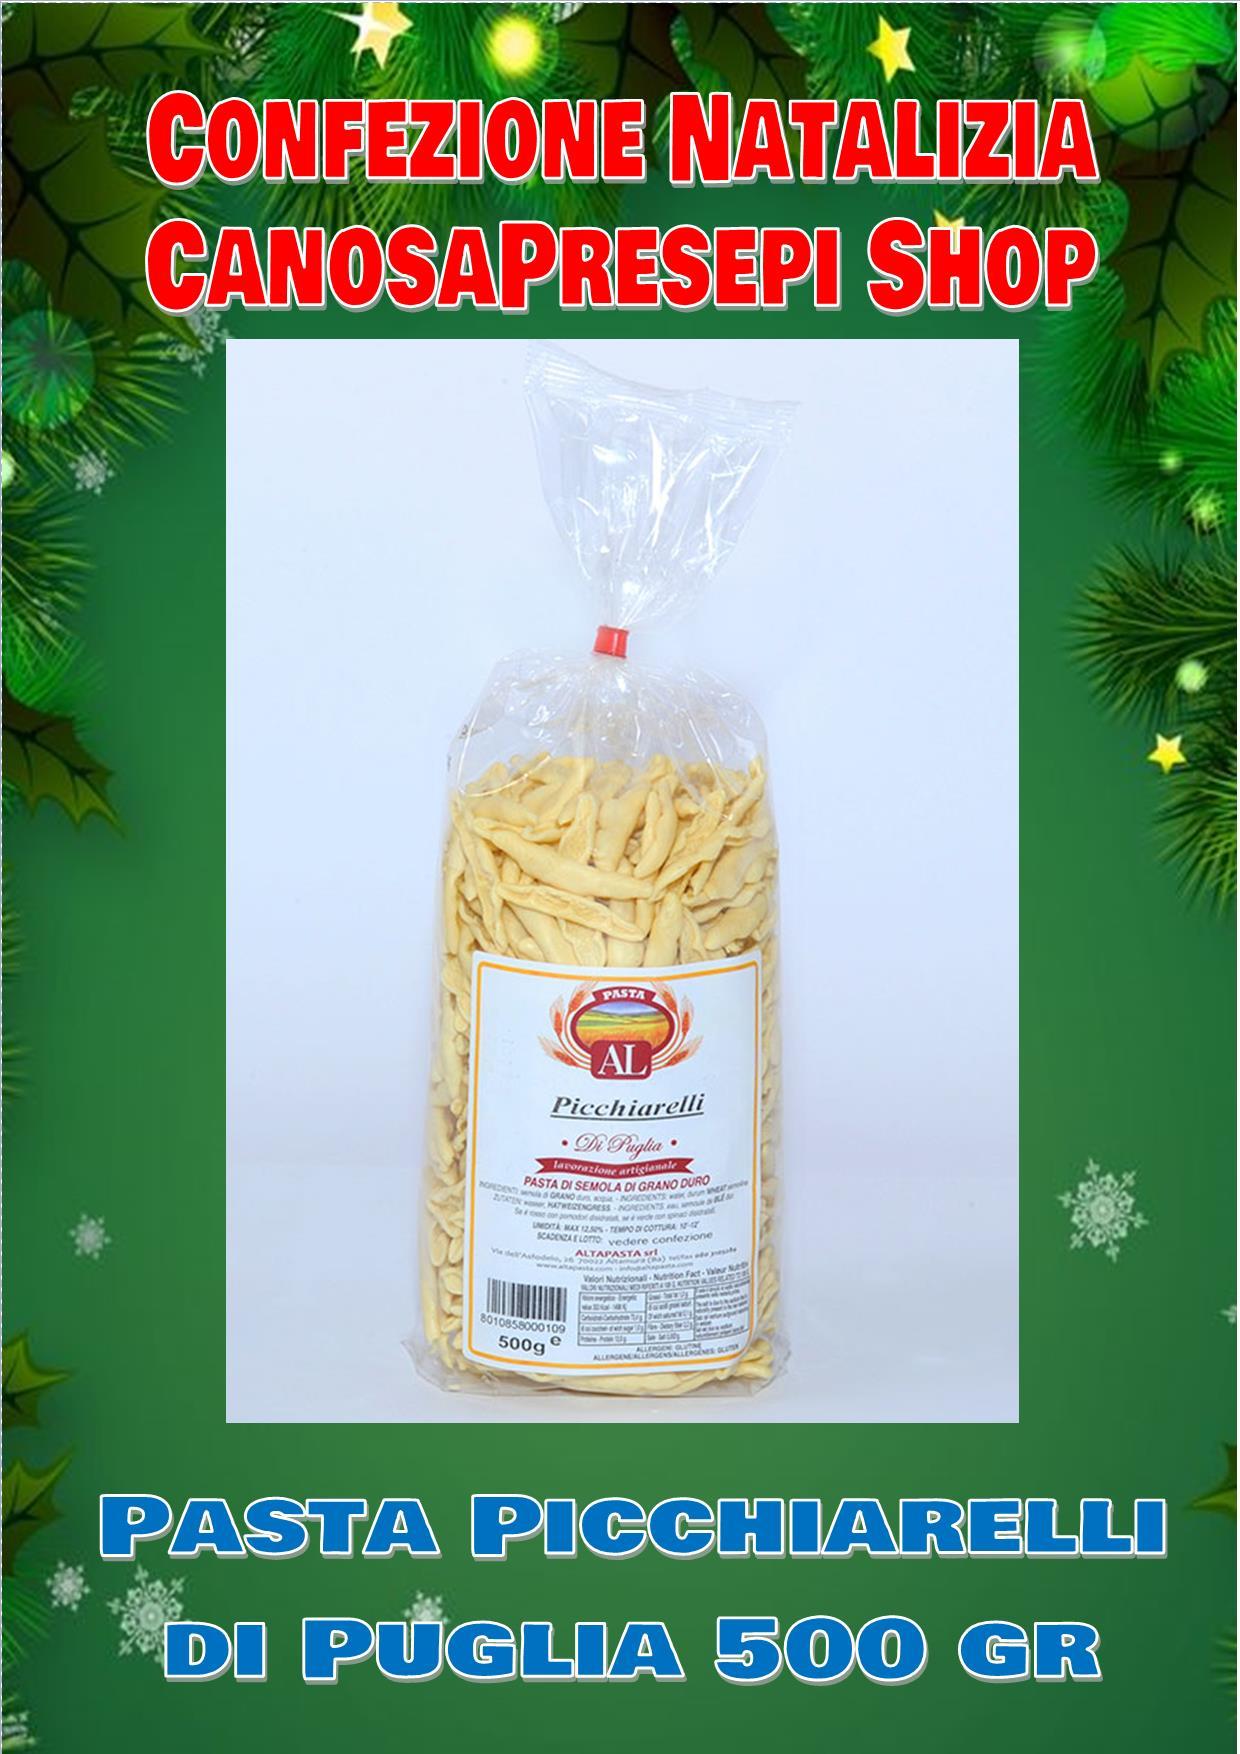 CanosaPresepiShop.2